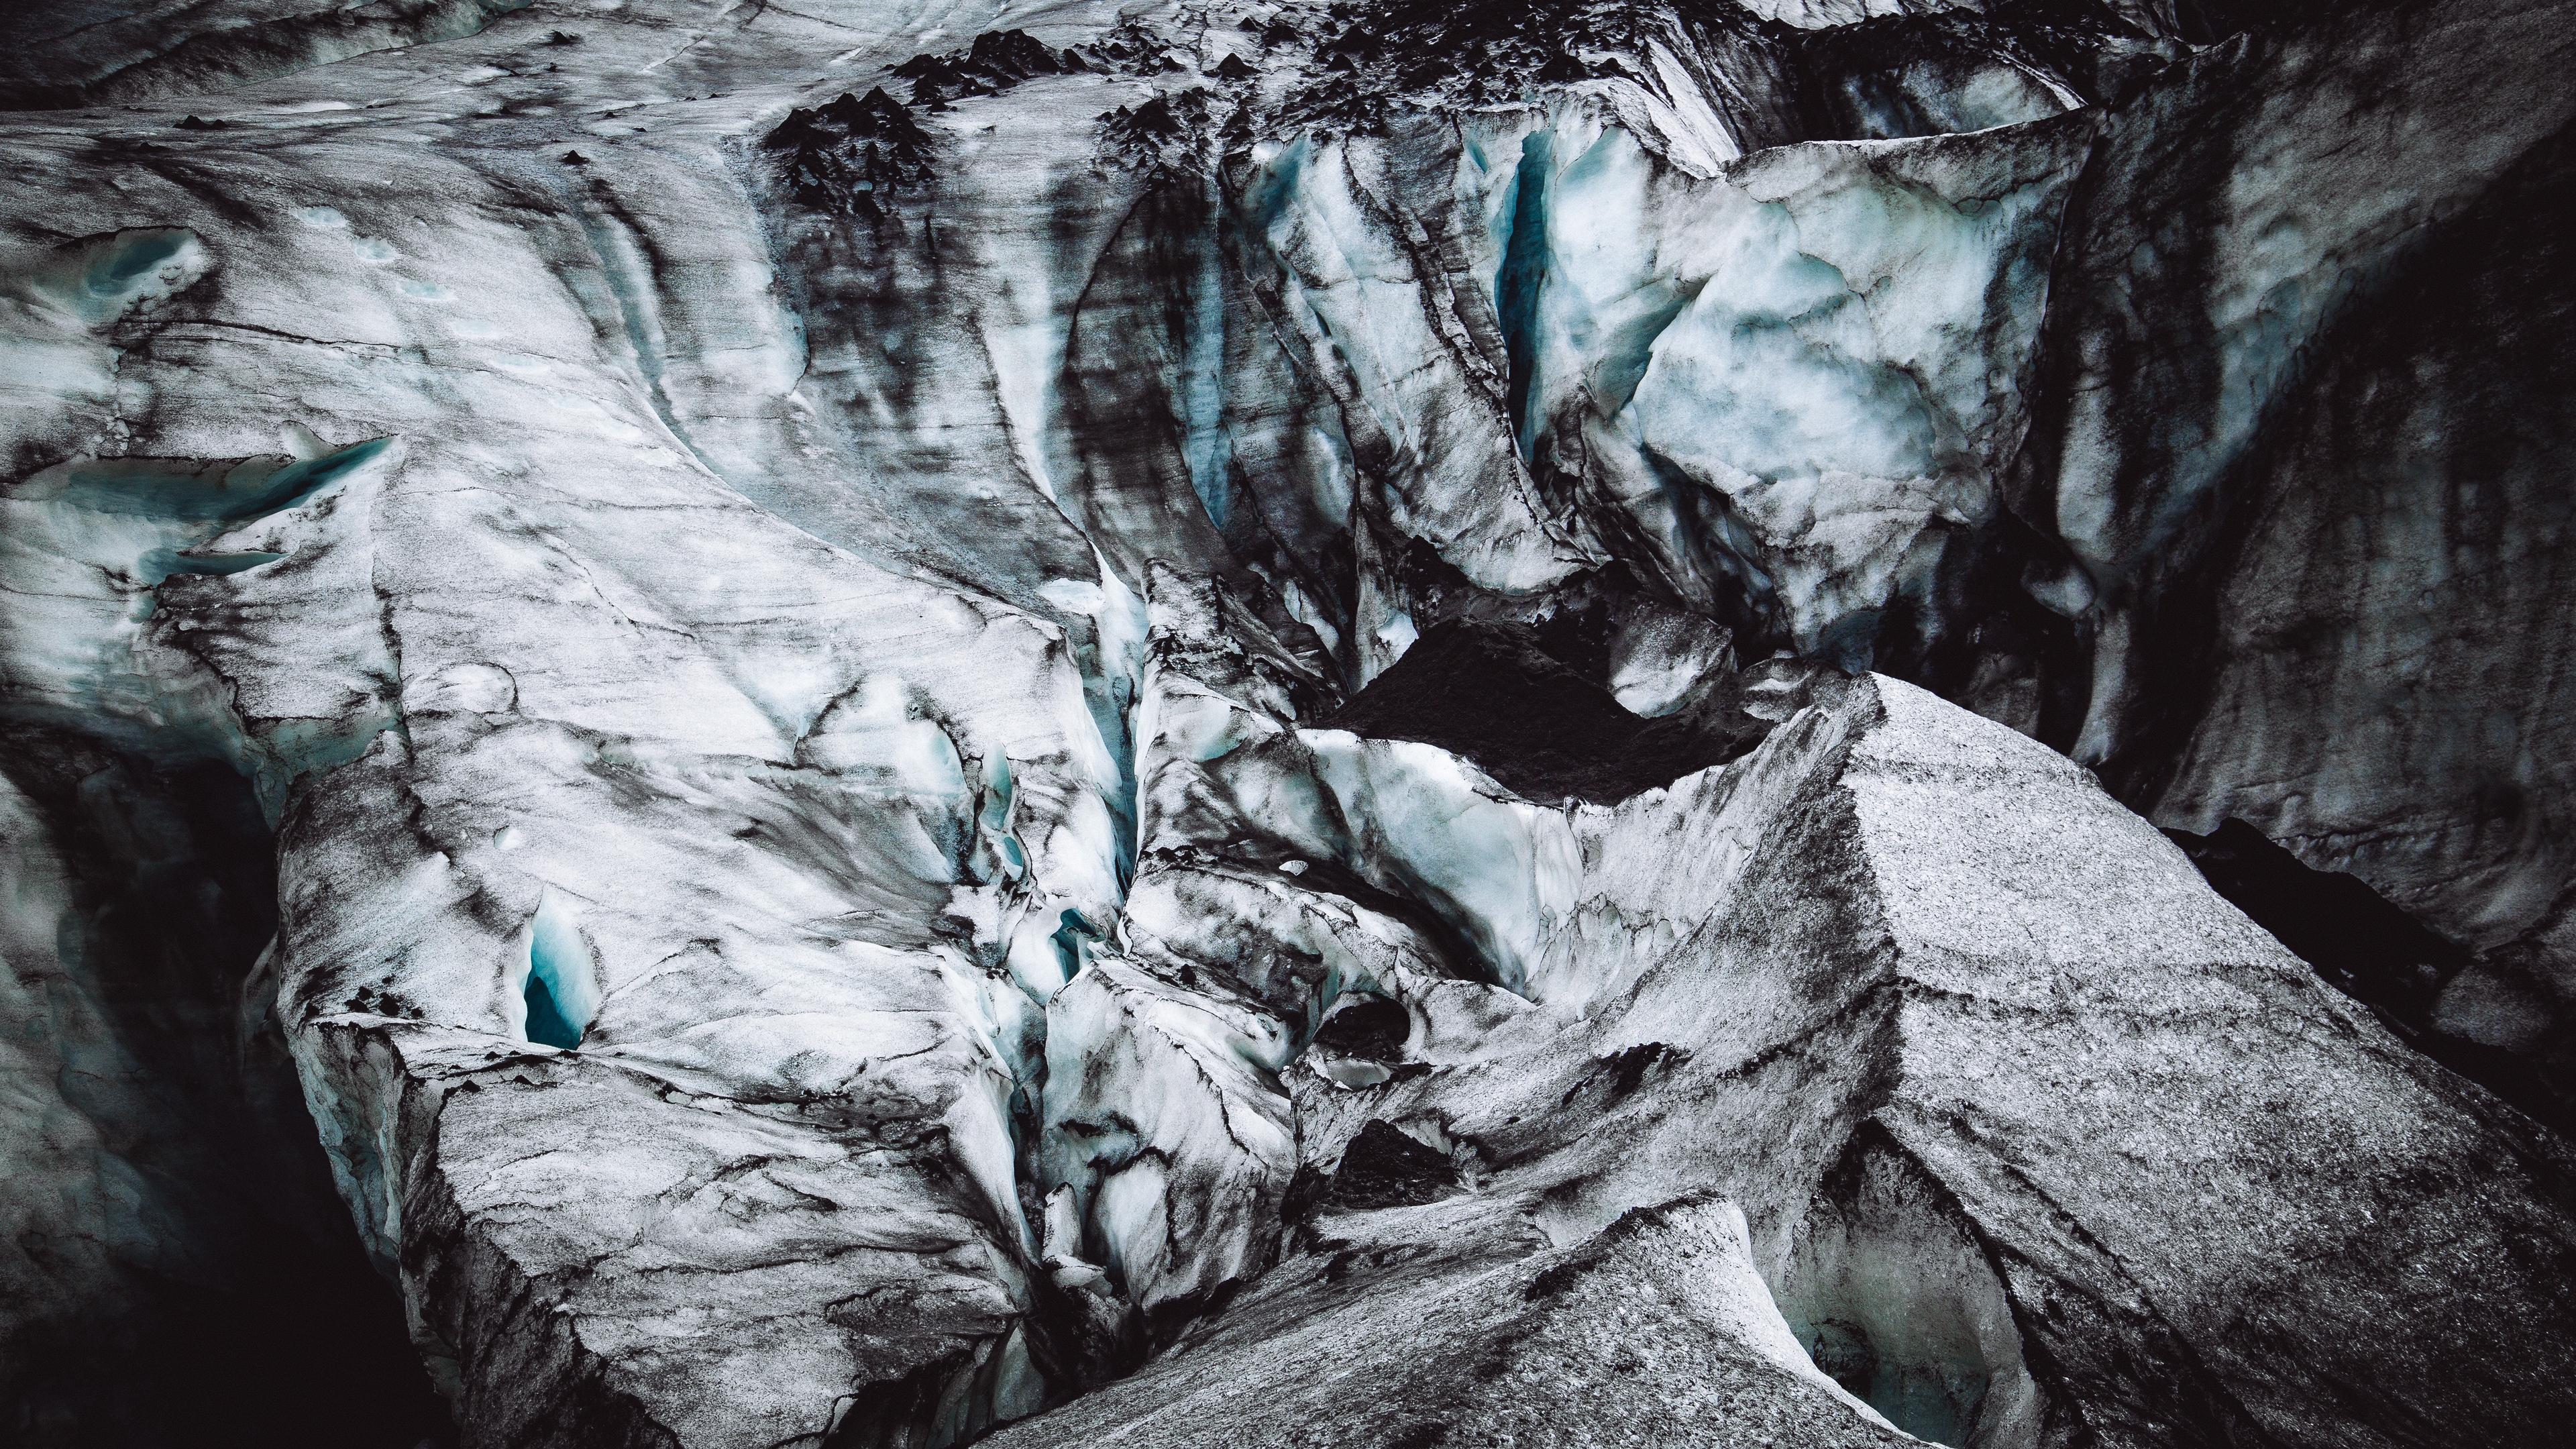 glacier cave surface iceland 4k 1541113533 - glacier, cave, surface, iceland 4k - Surface, Glacier, Cave